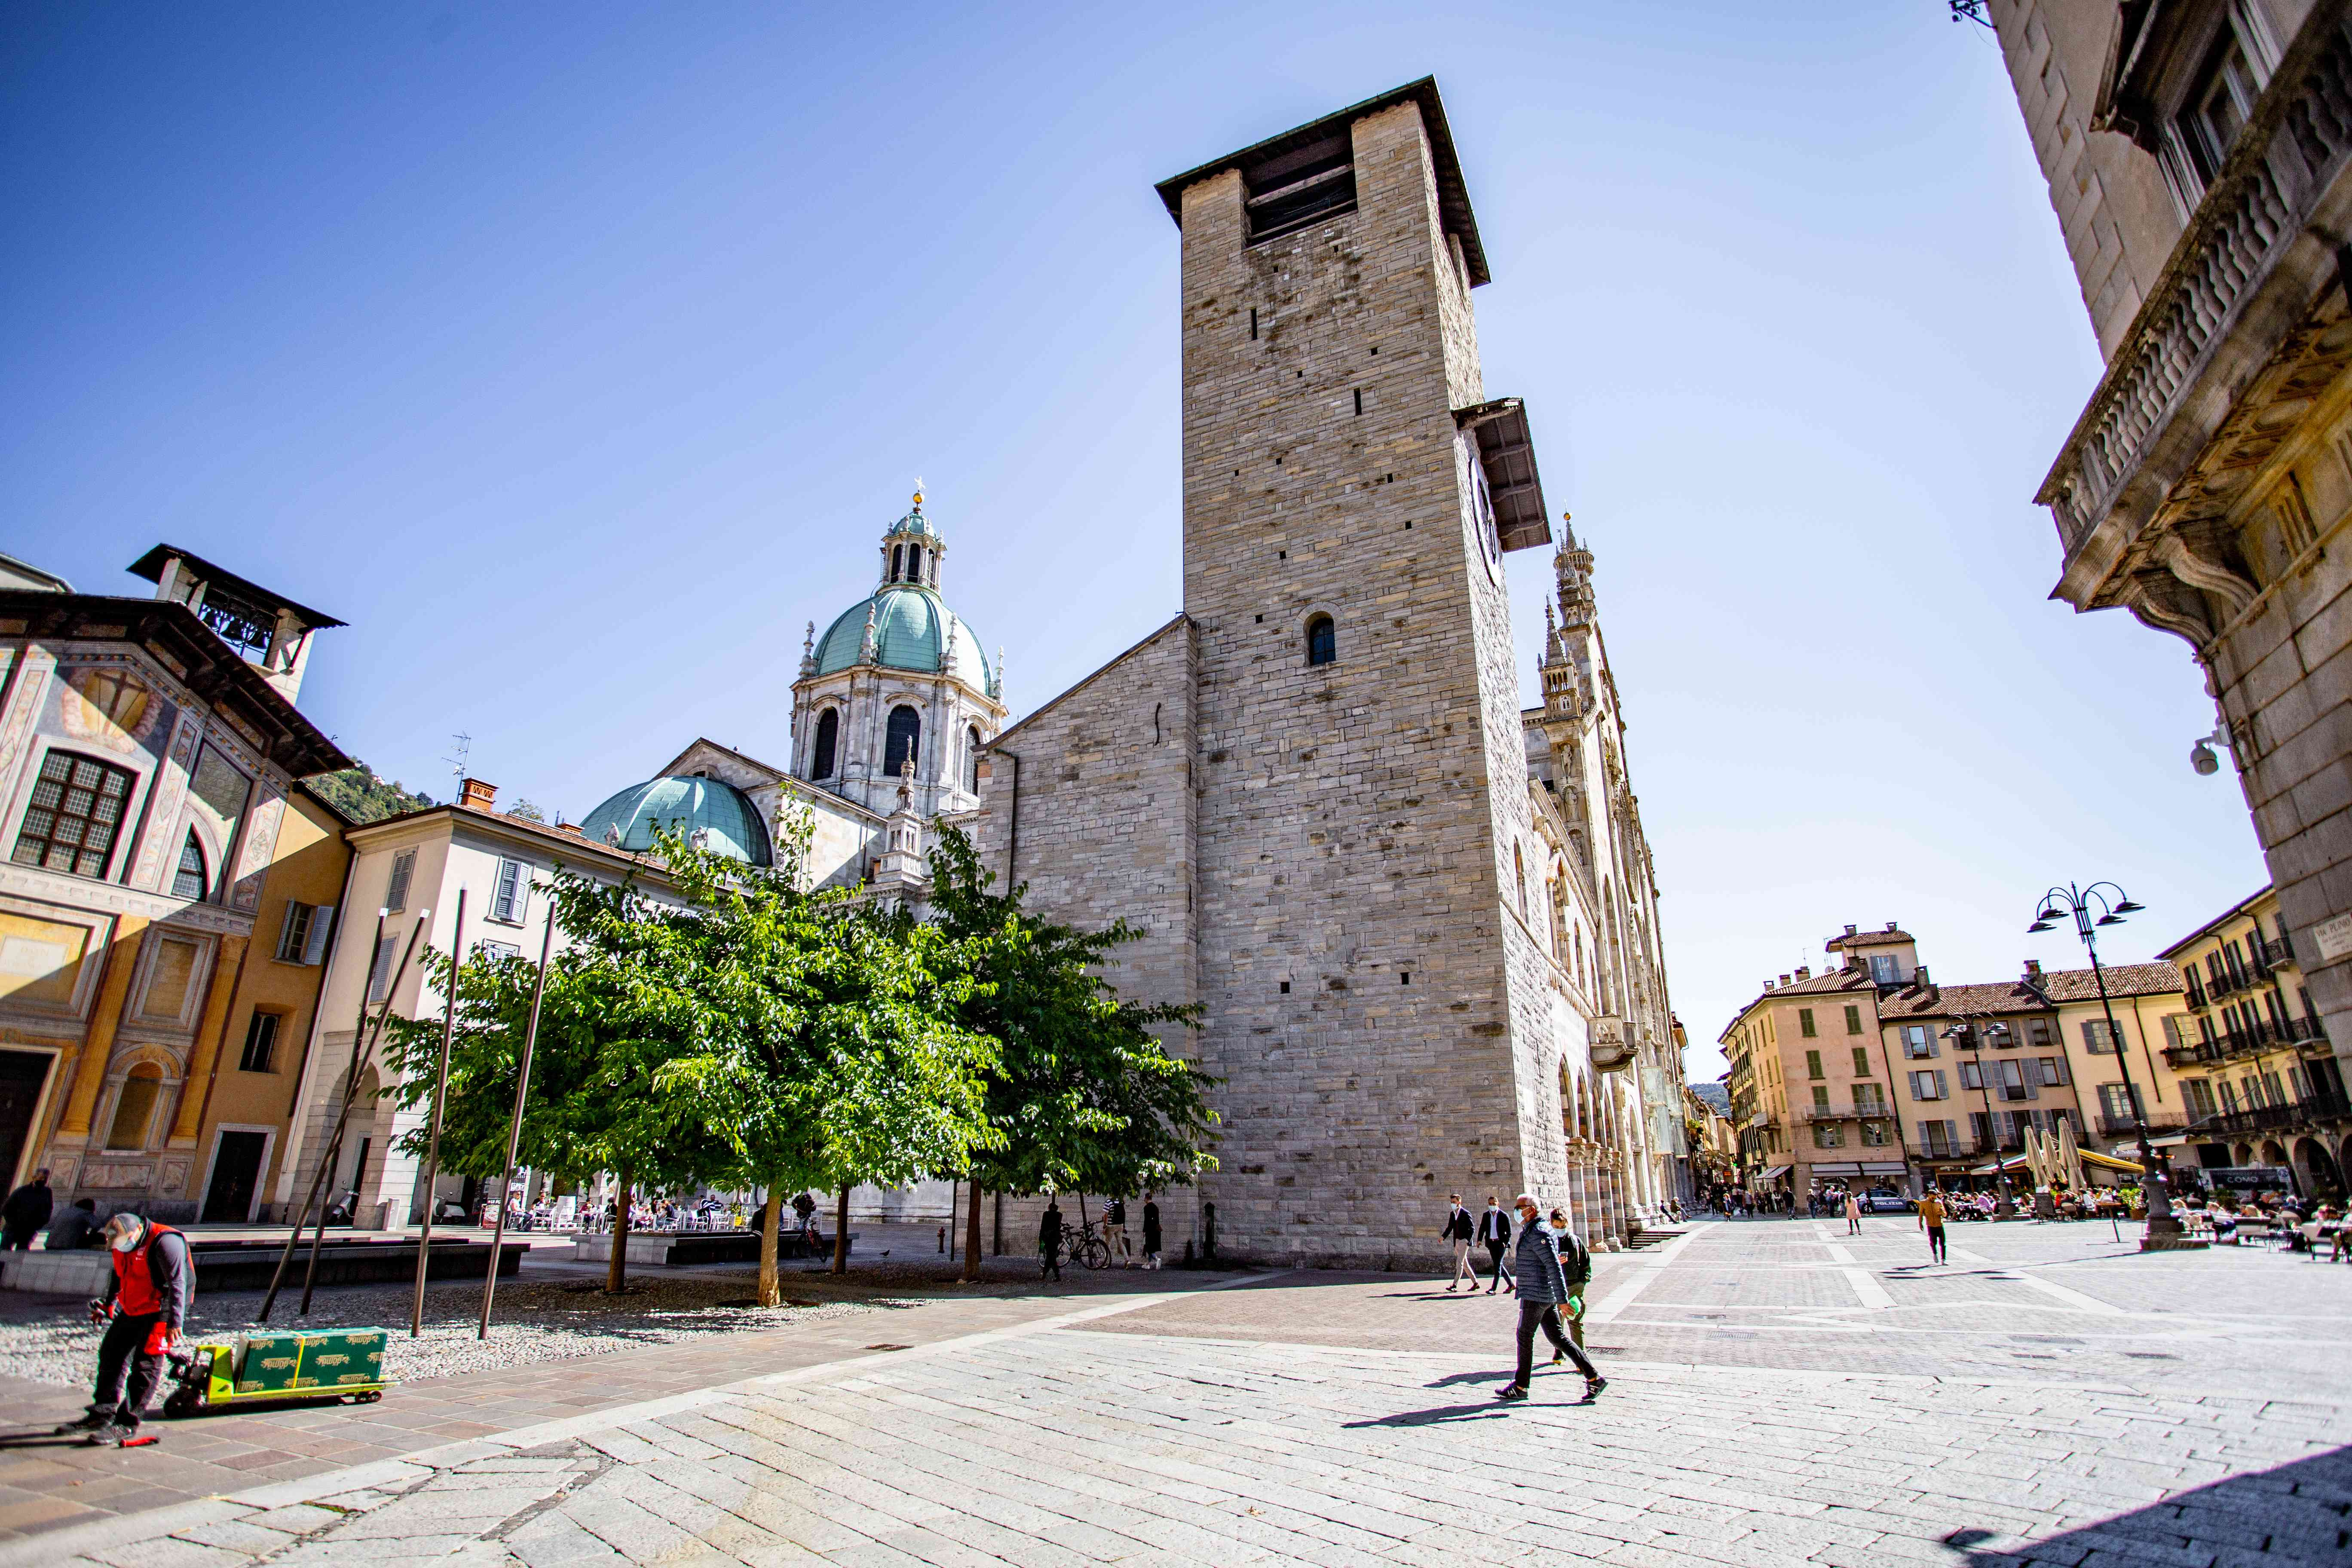 City of Como in Italy